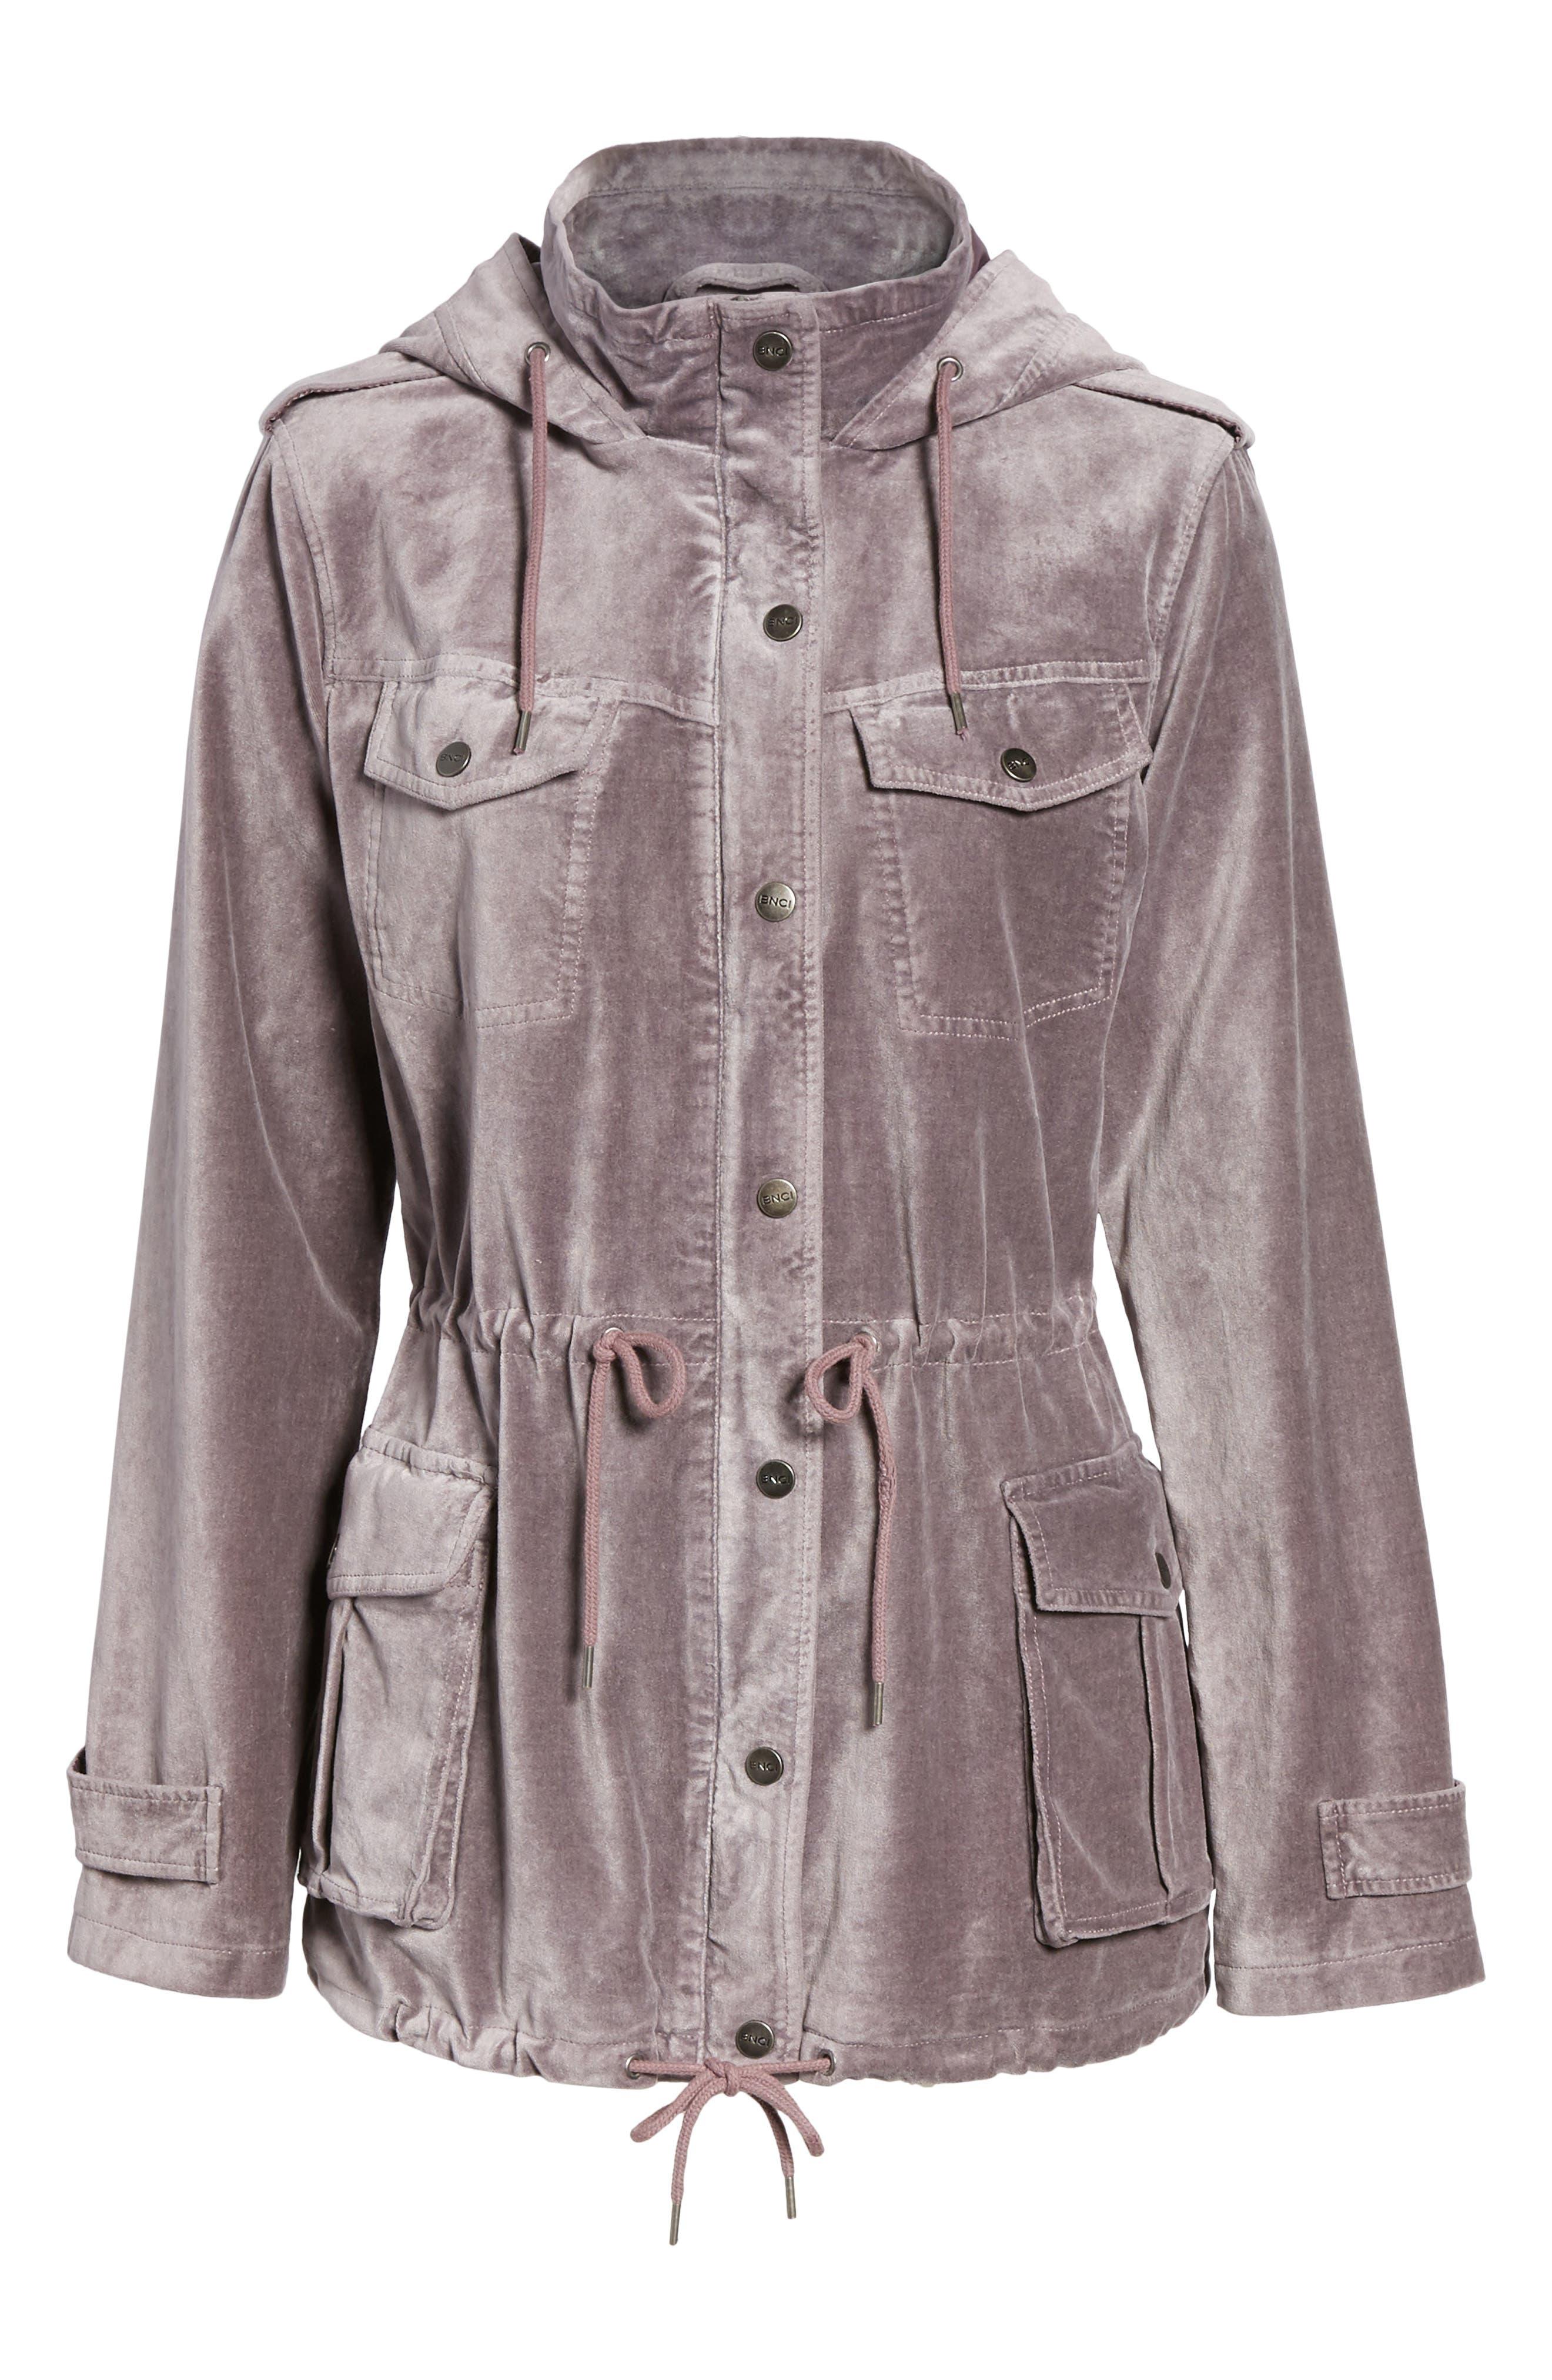 BNCI Cotton Velveteen Hooded Anorak Jacket,                             Alternate thumbnail 10, color,